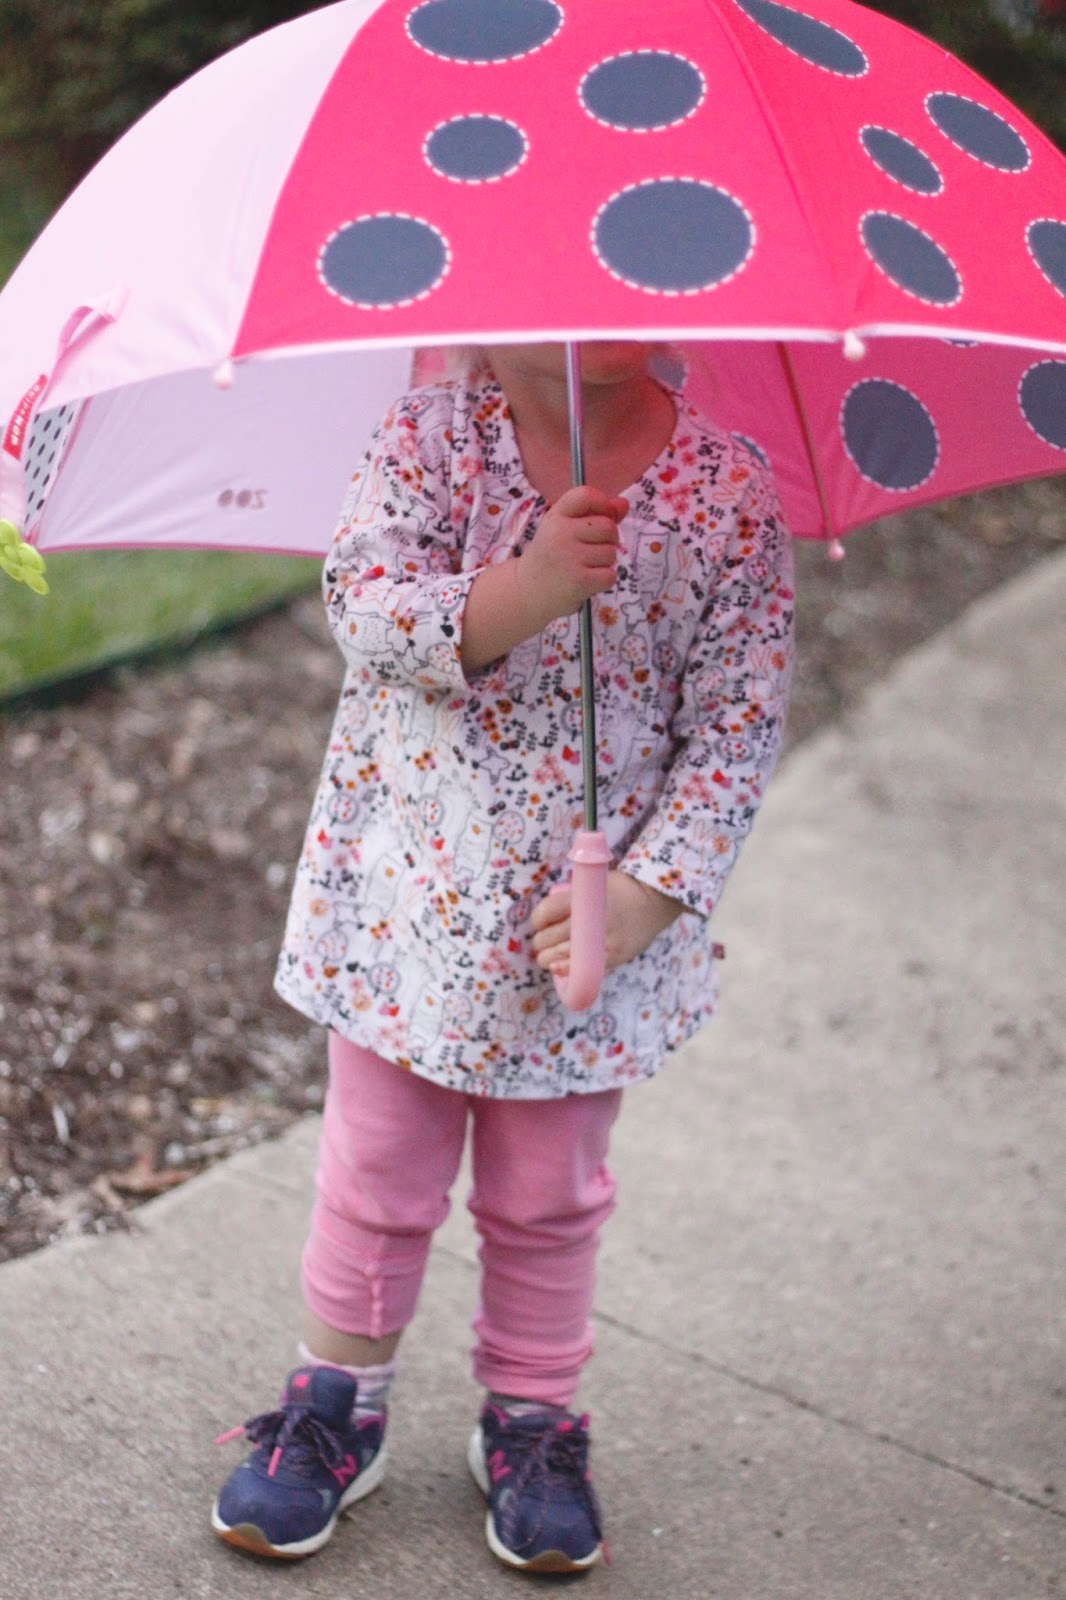 review of ladybug Zoobrella umbrella by Skip Hop and Zutano kids